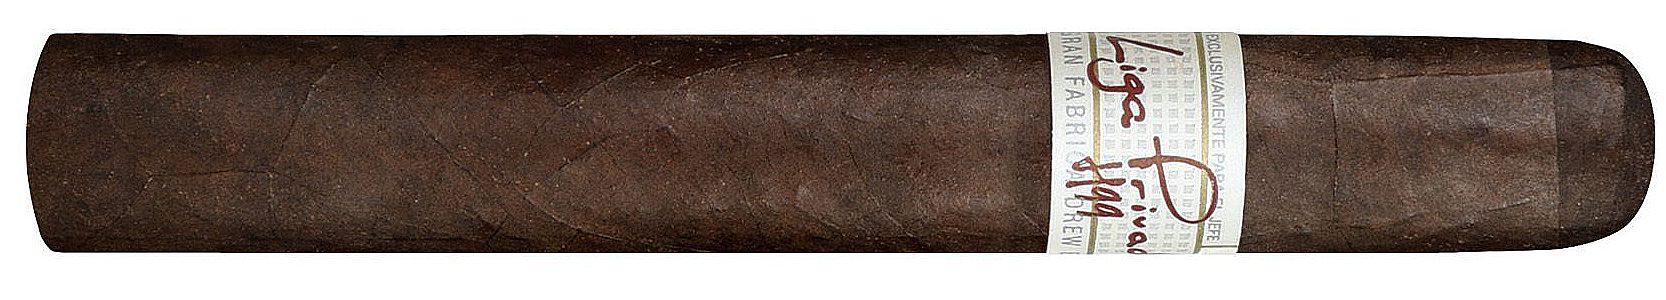 #nowsmoking drew estate liga privada h99 cigar review at Famous Smoke Shop